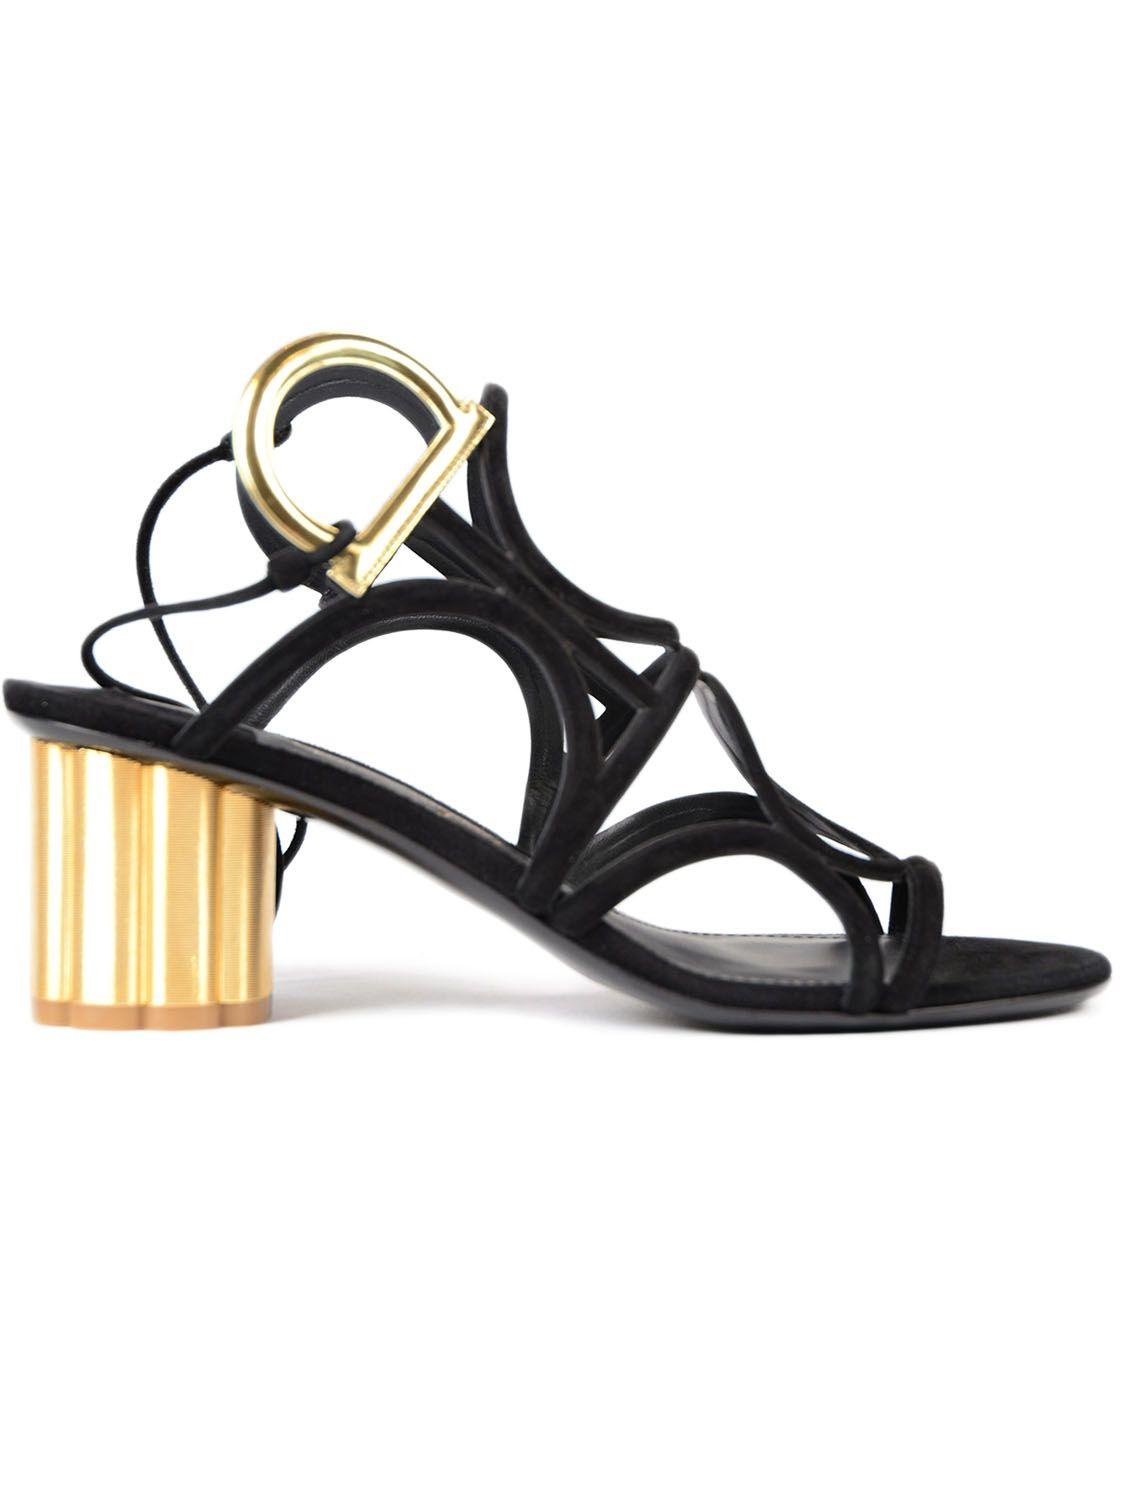 Salvatore Ferragamo Da Vinci 55 Sandals